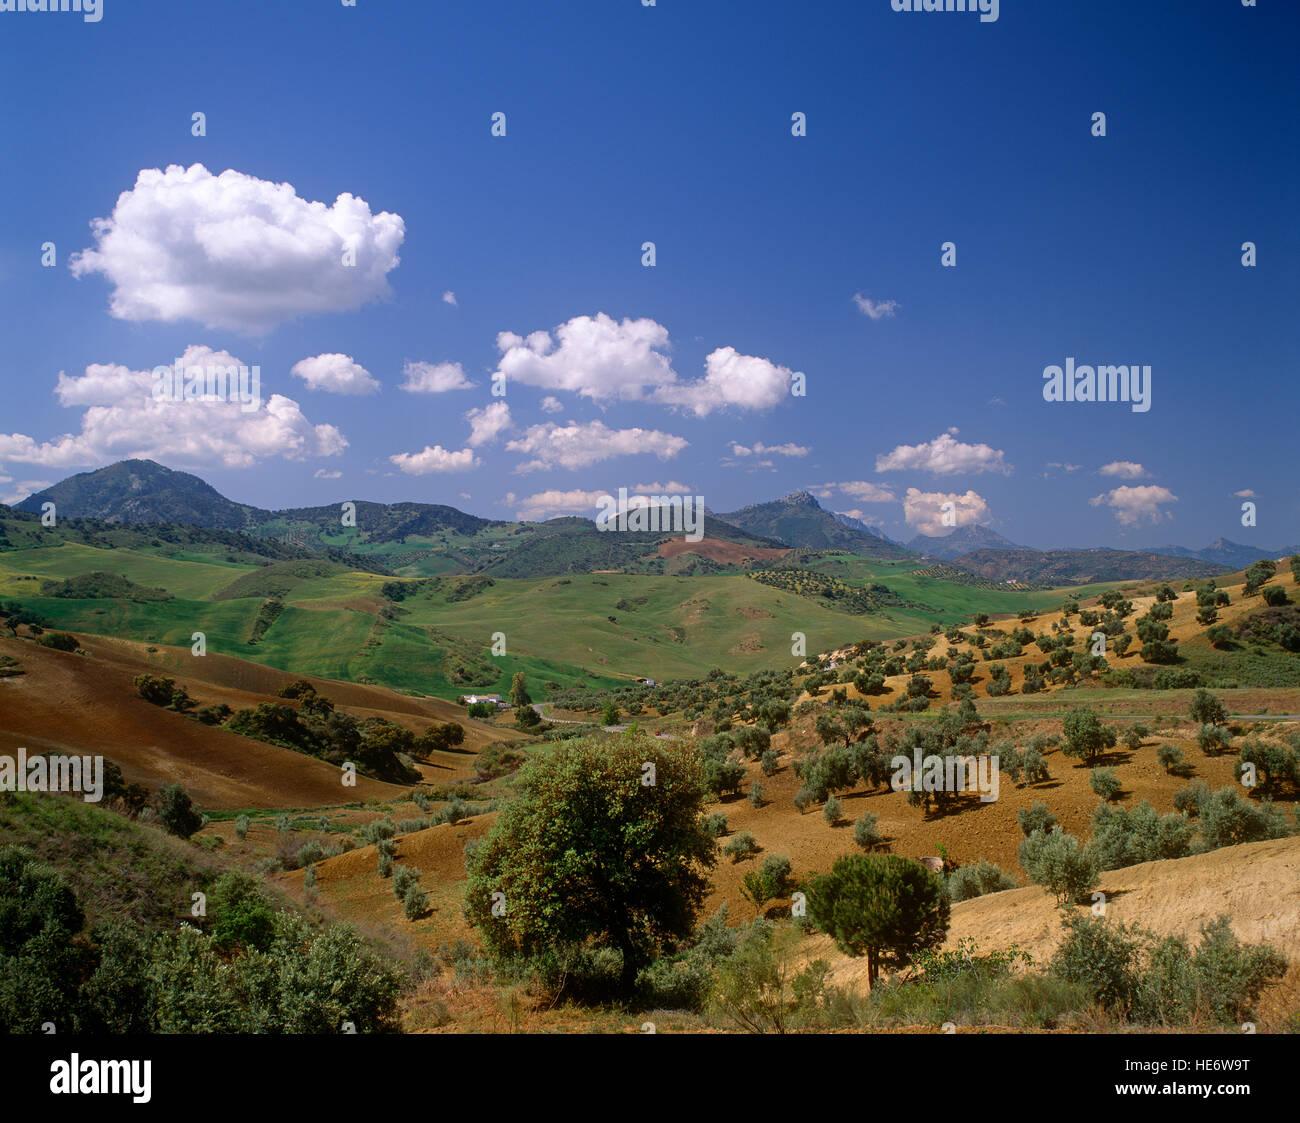 Andalucian landscape near Granada, Spain - Stock Image